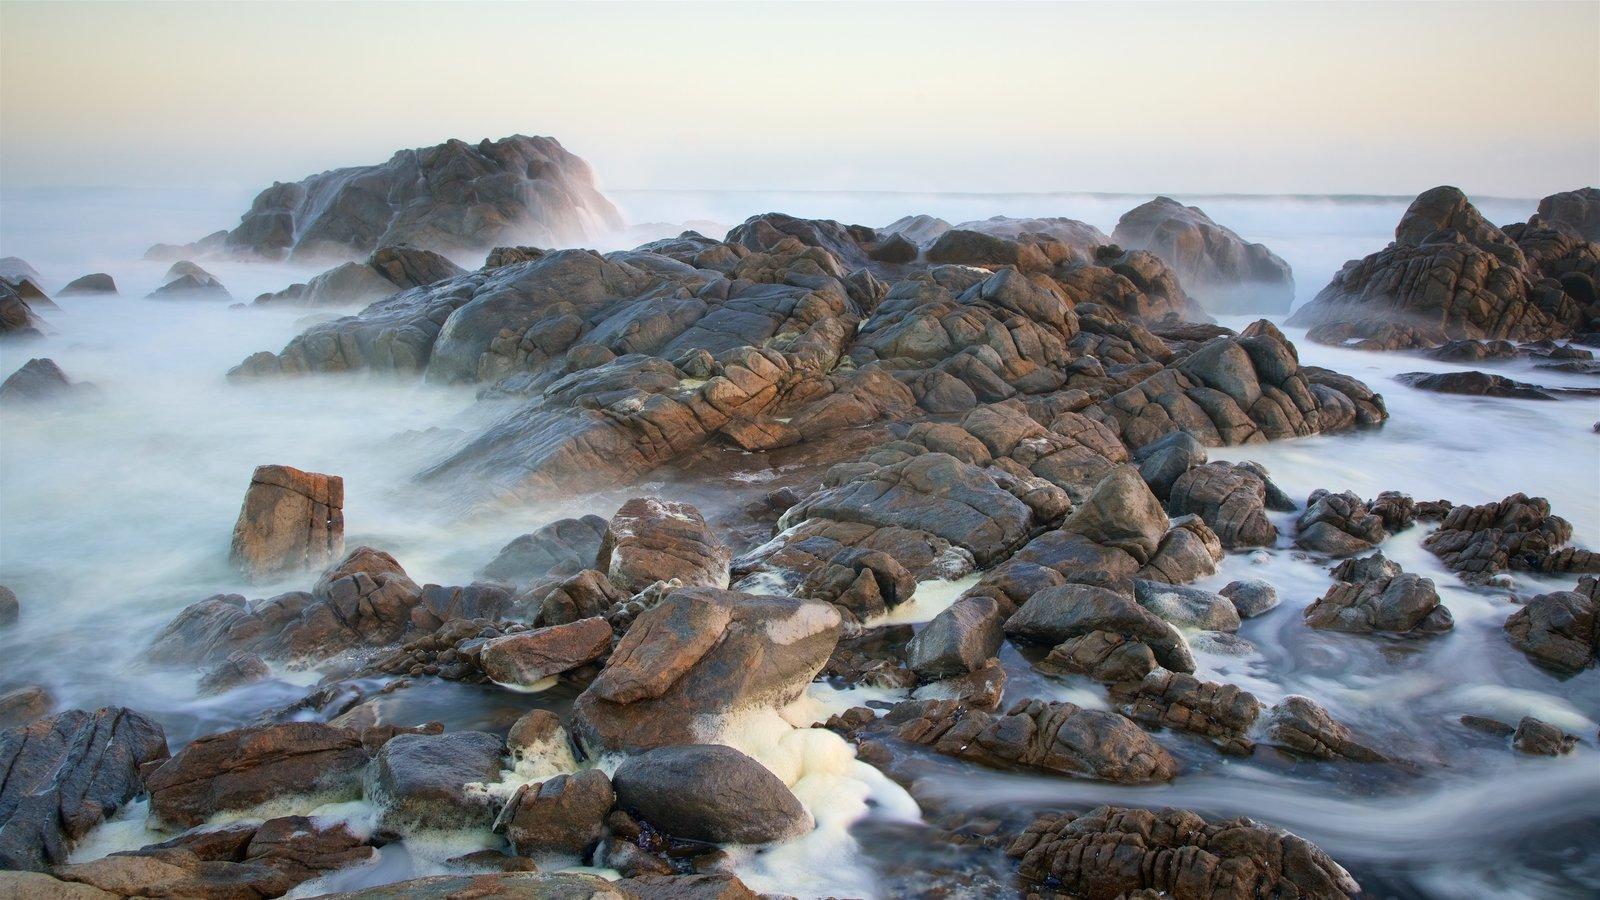 West Coast National Park showing waves and rugged coastline